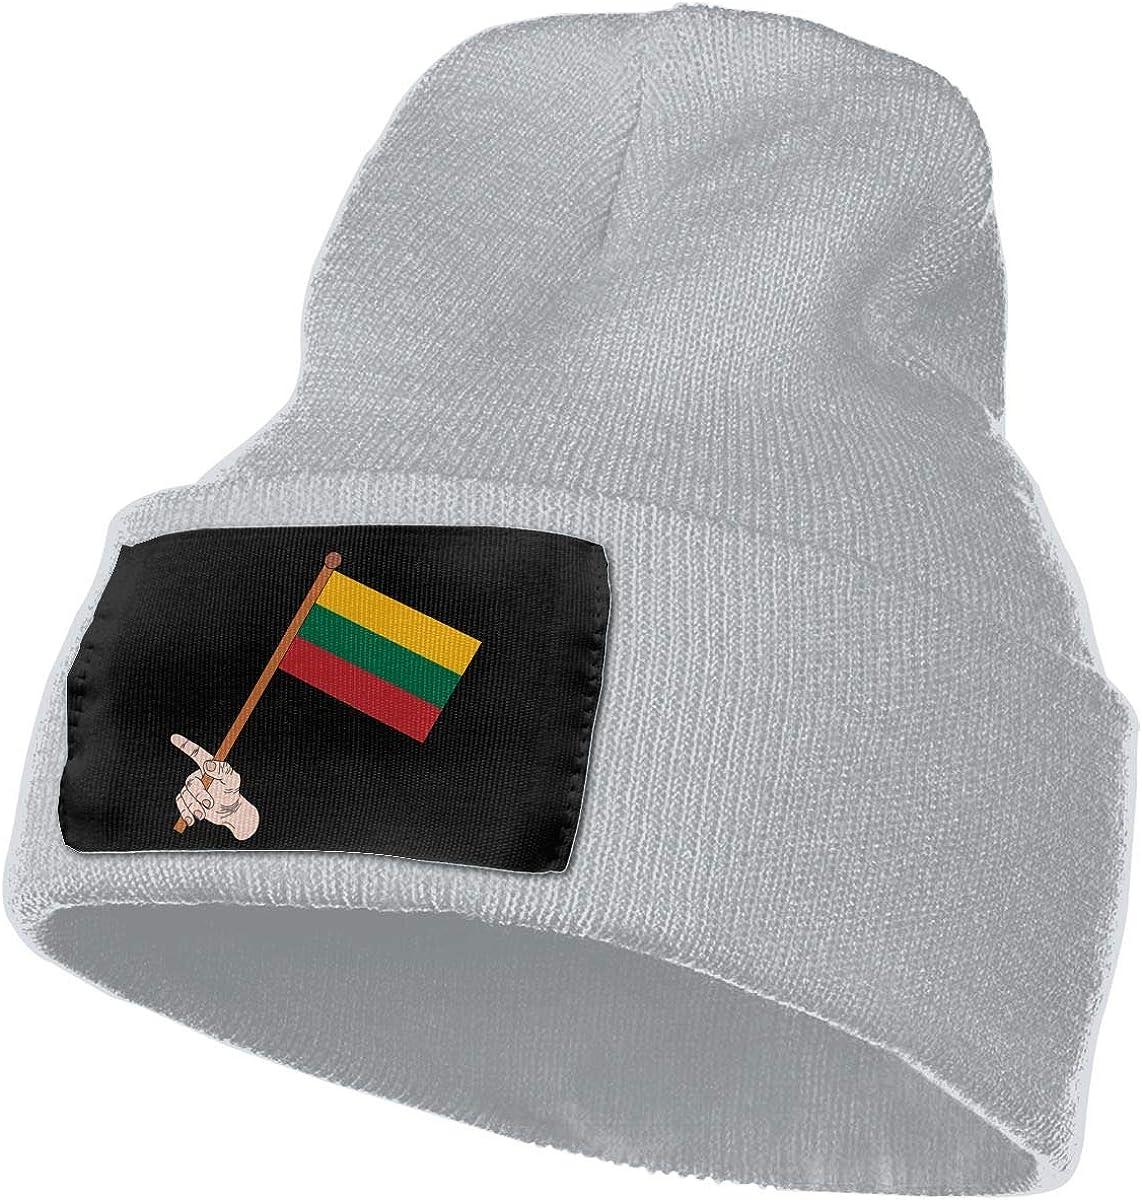 SLADDD1 Flag Warm Winter Hat Knit Beanie Skull Cap Cuff Beanie Hat Winter Hats for Men /& Women